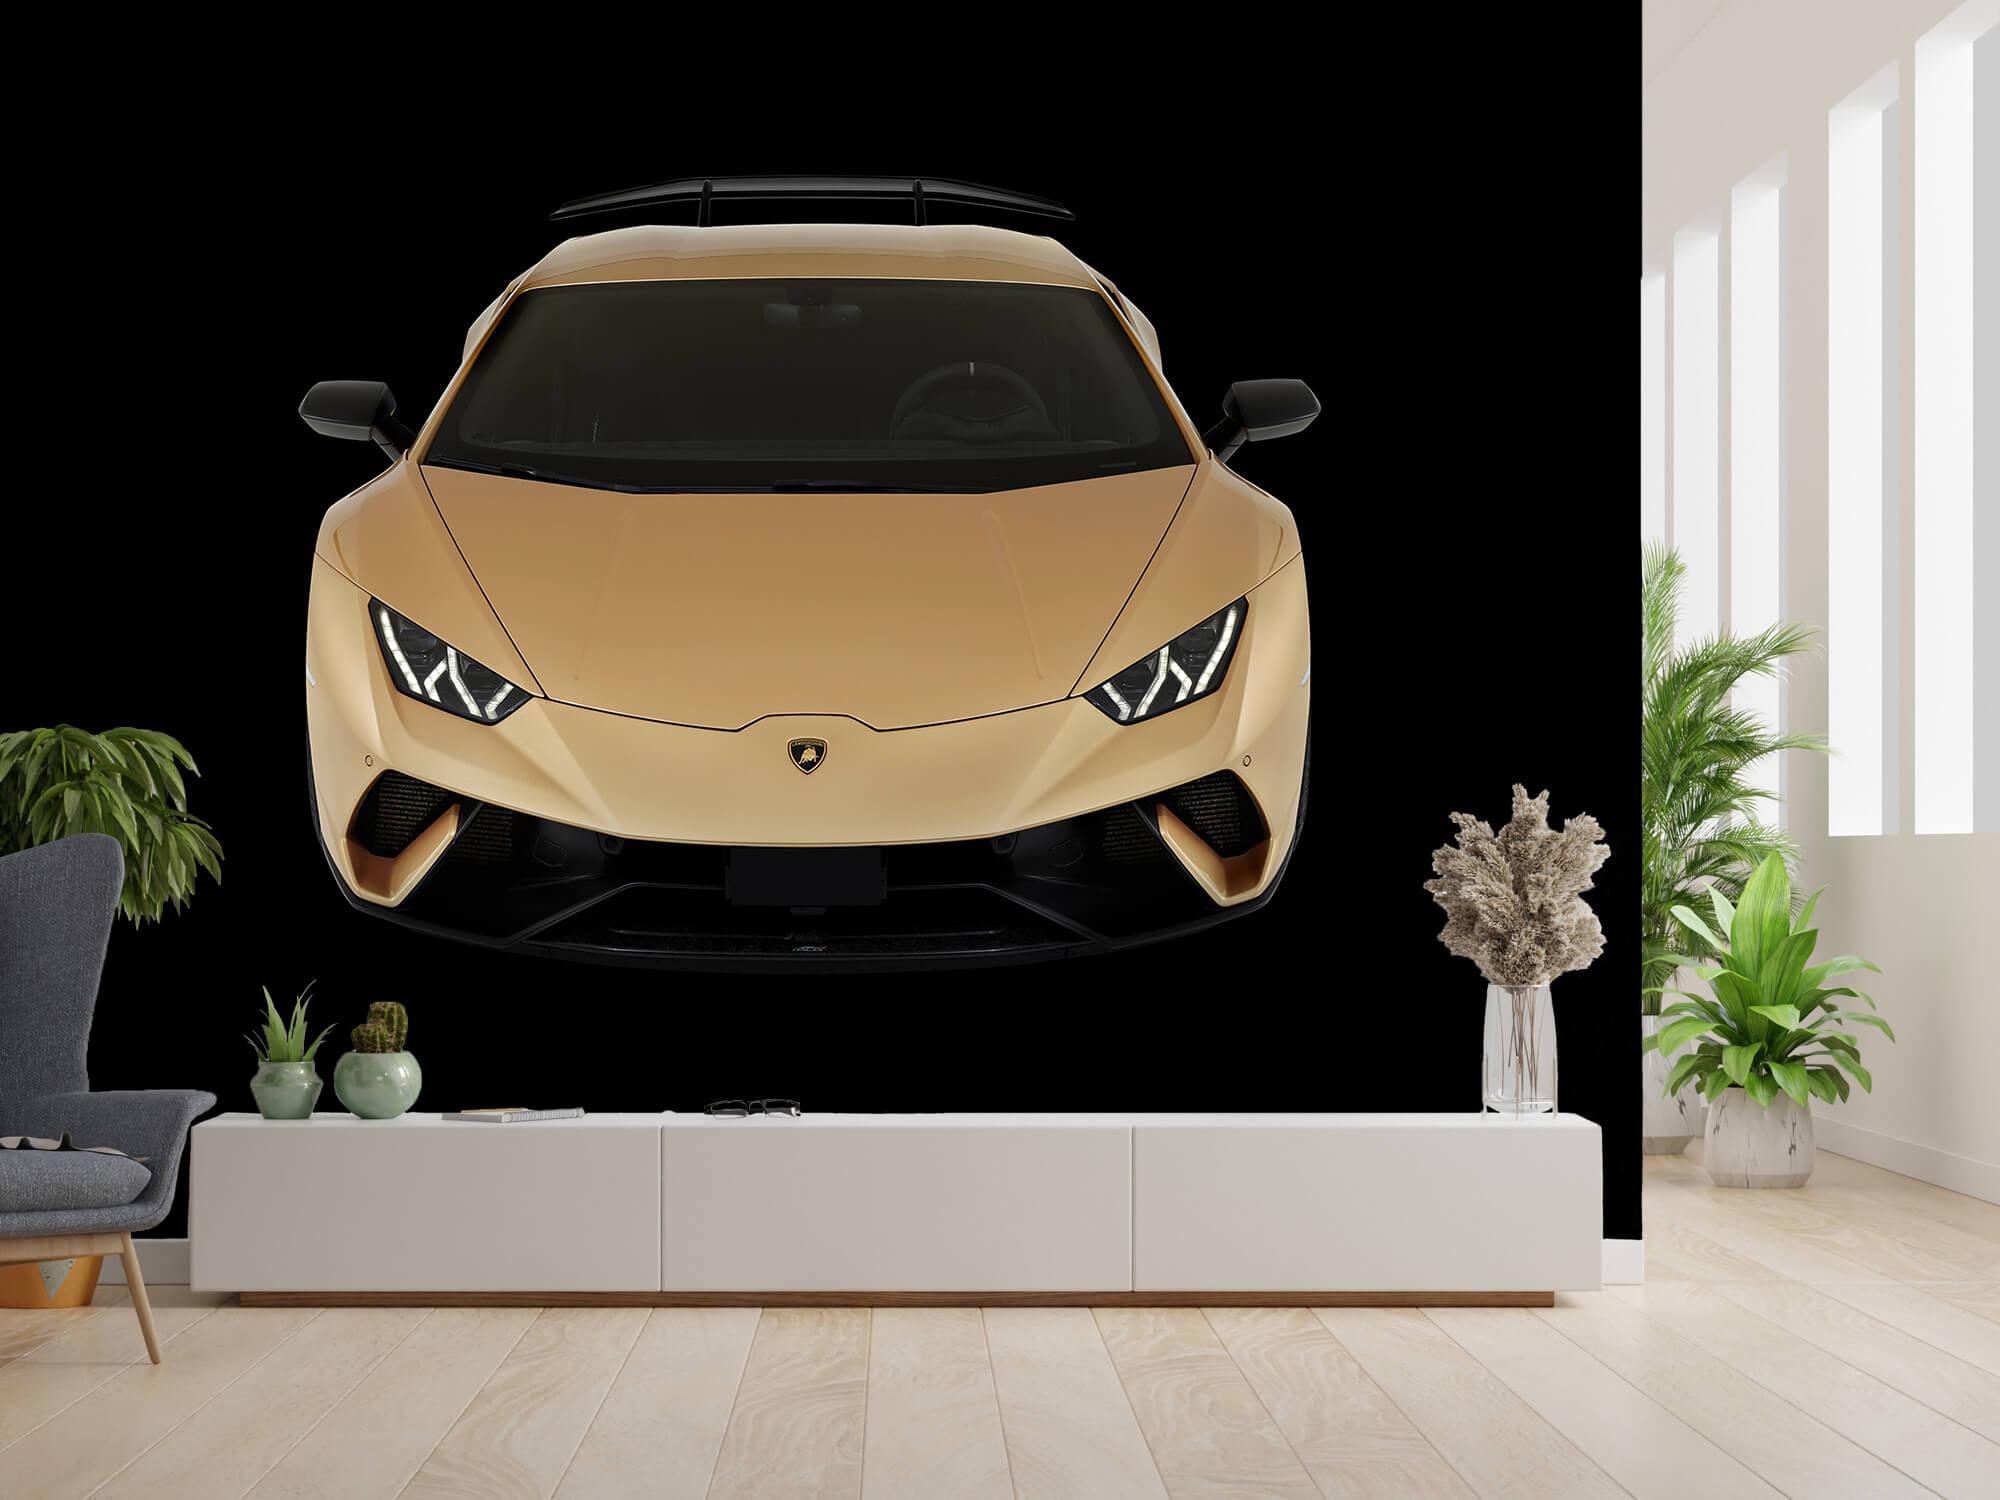 Wallpaper Lamborghini Huracán - Front from above, black 14